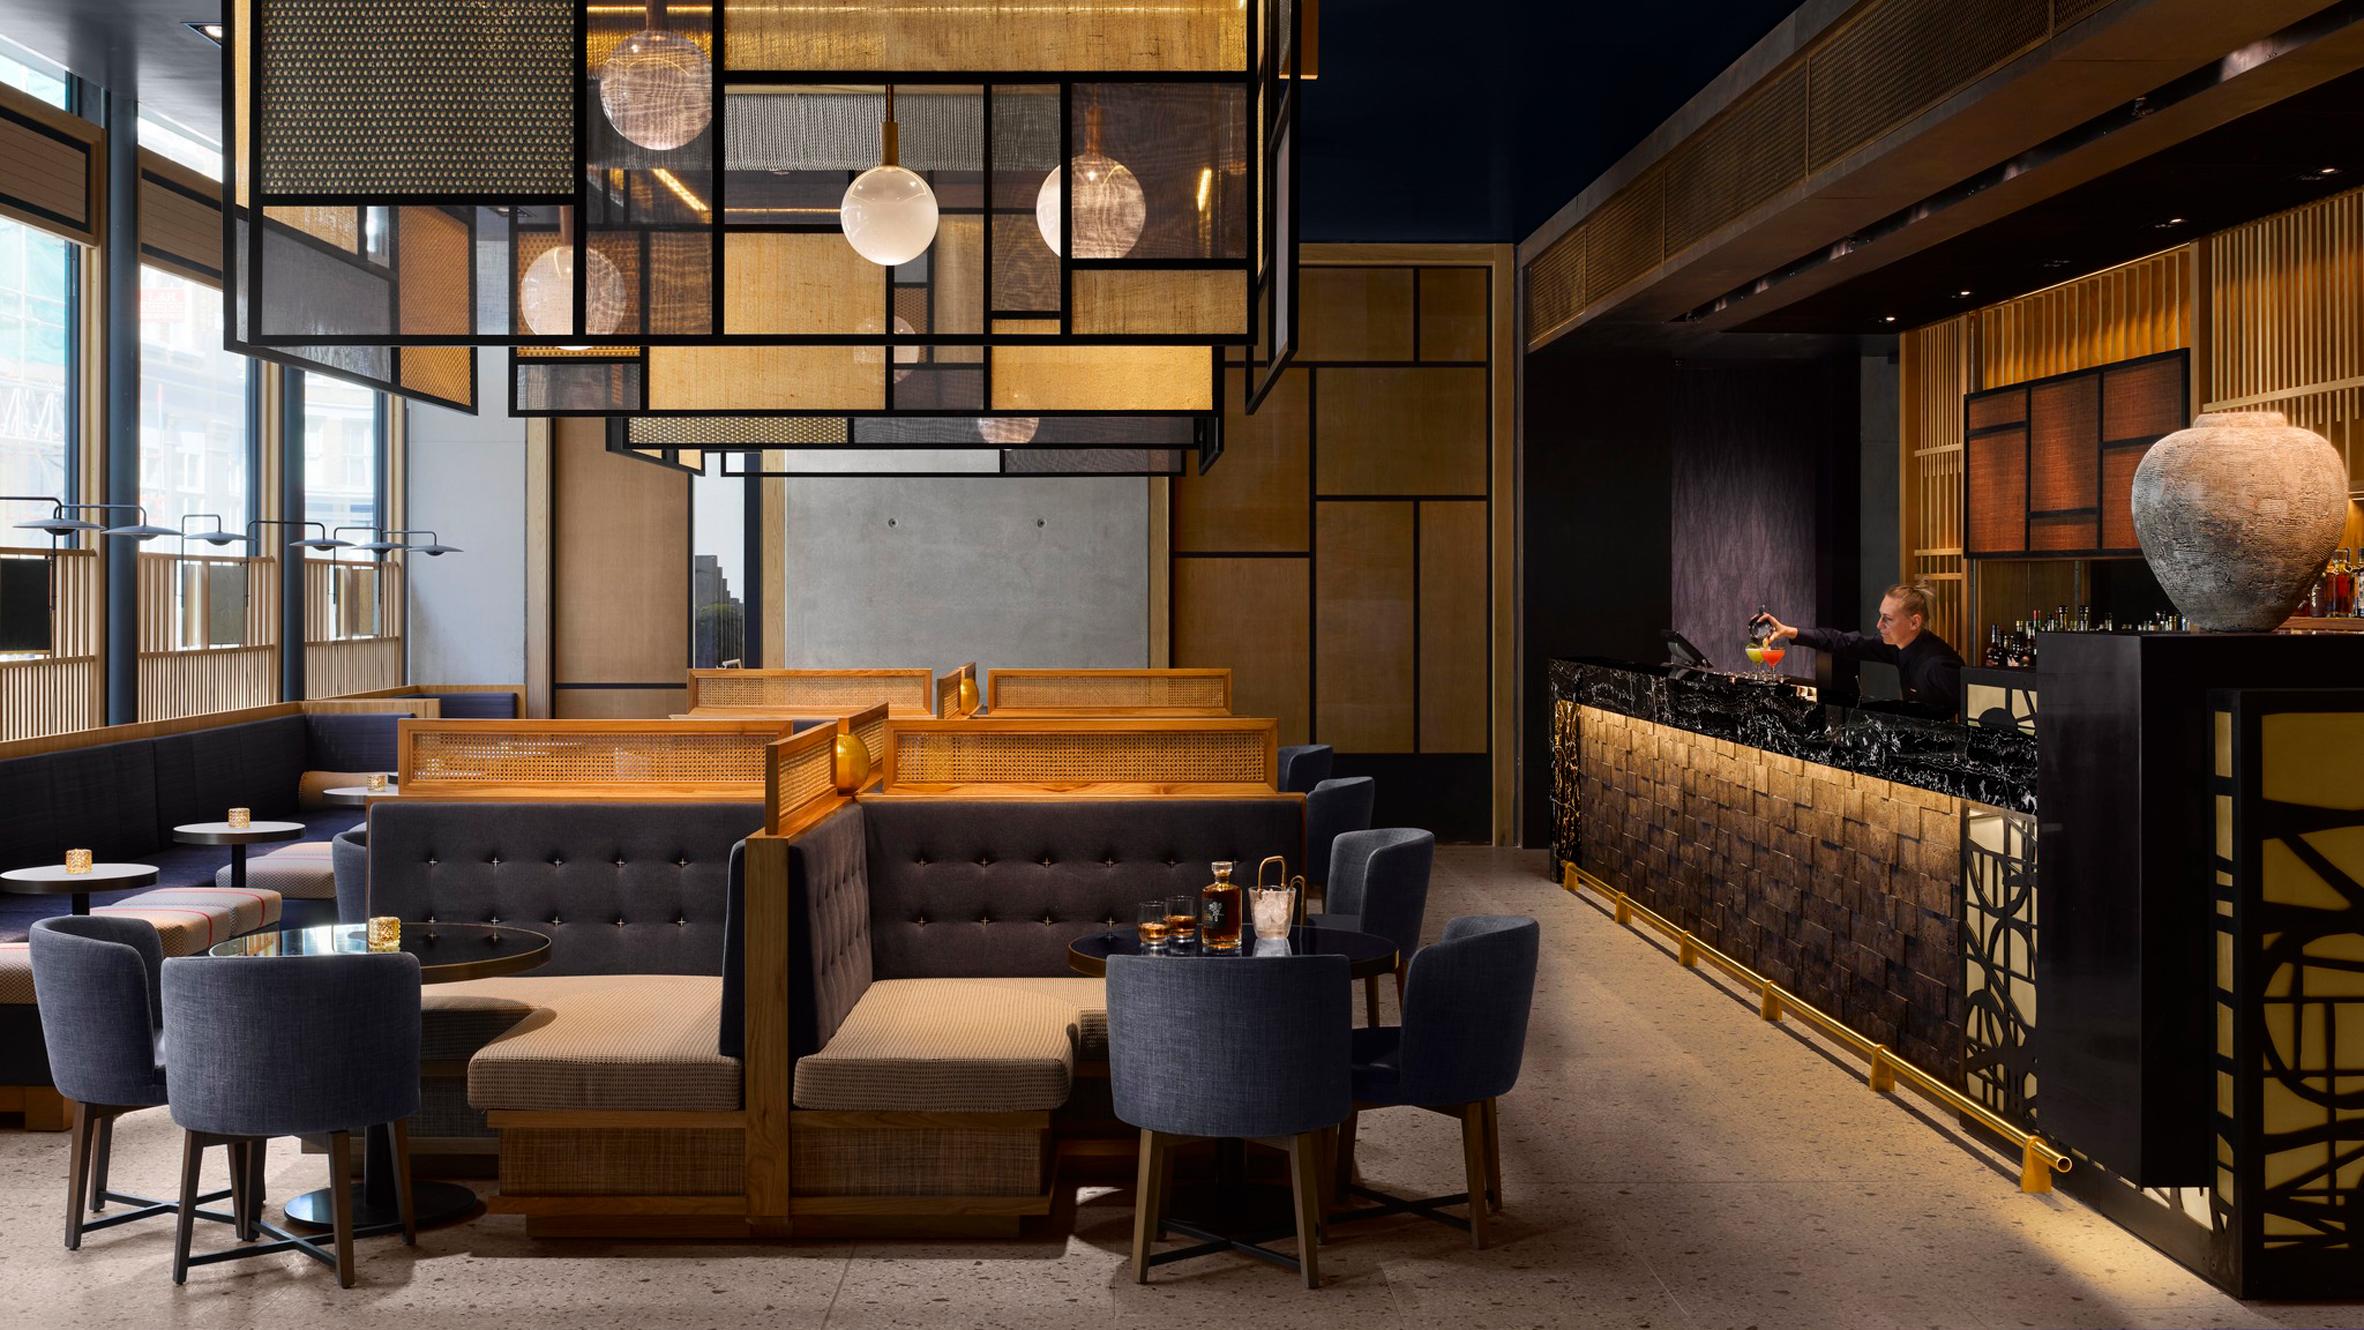 Nobu Hotel Shoreditch, London, UK, by Studio Mica